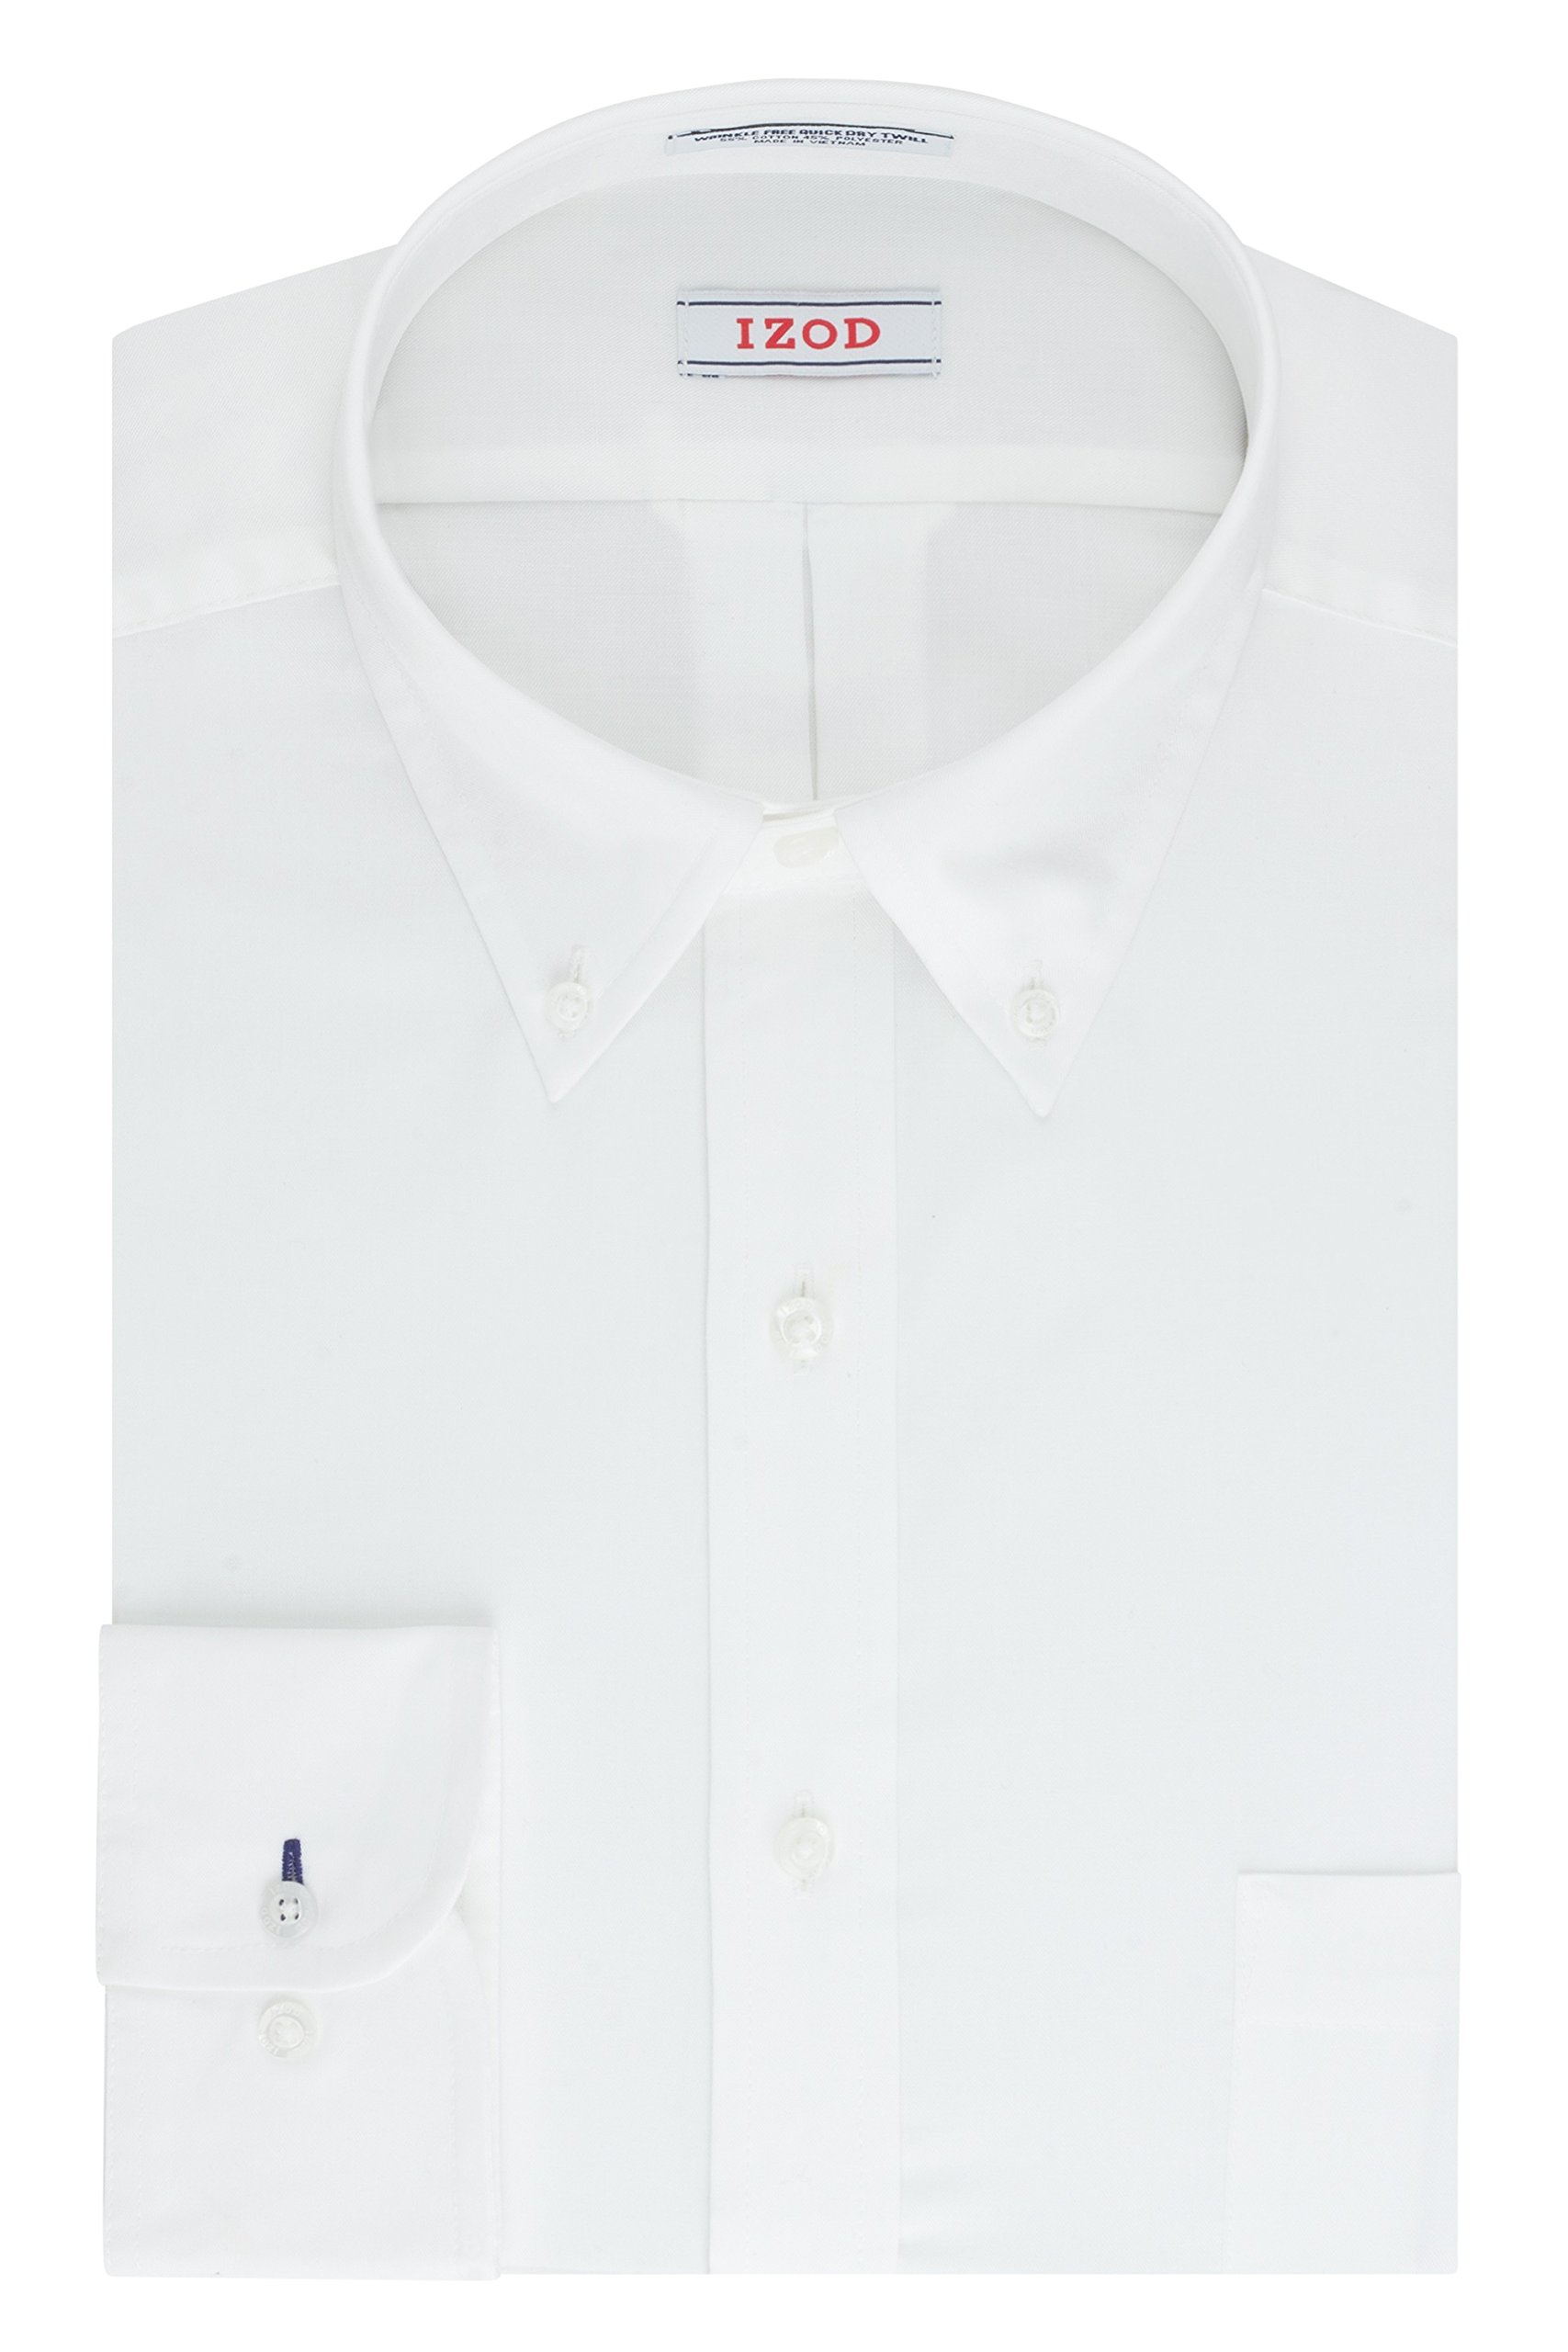 IZOD Men's Twill Regular Fit Solid Button Down Collar Dress Shirt, White, 17.5'' Neck 34''-35'' Sleeve